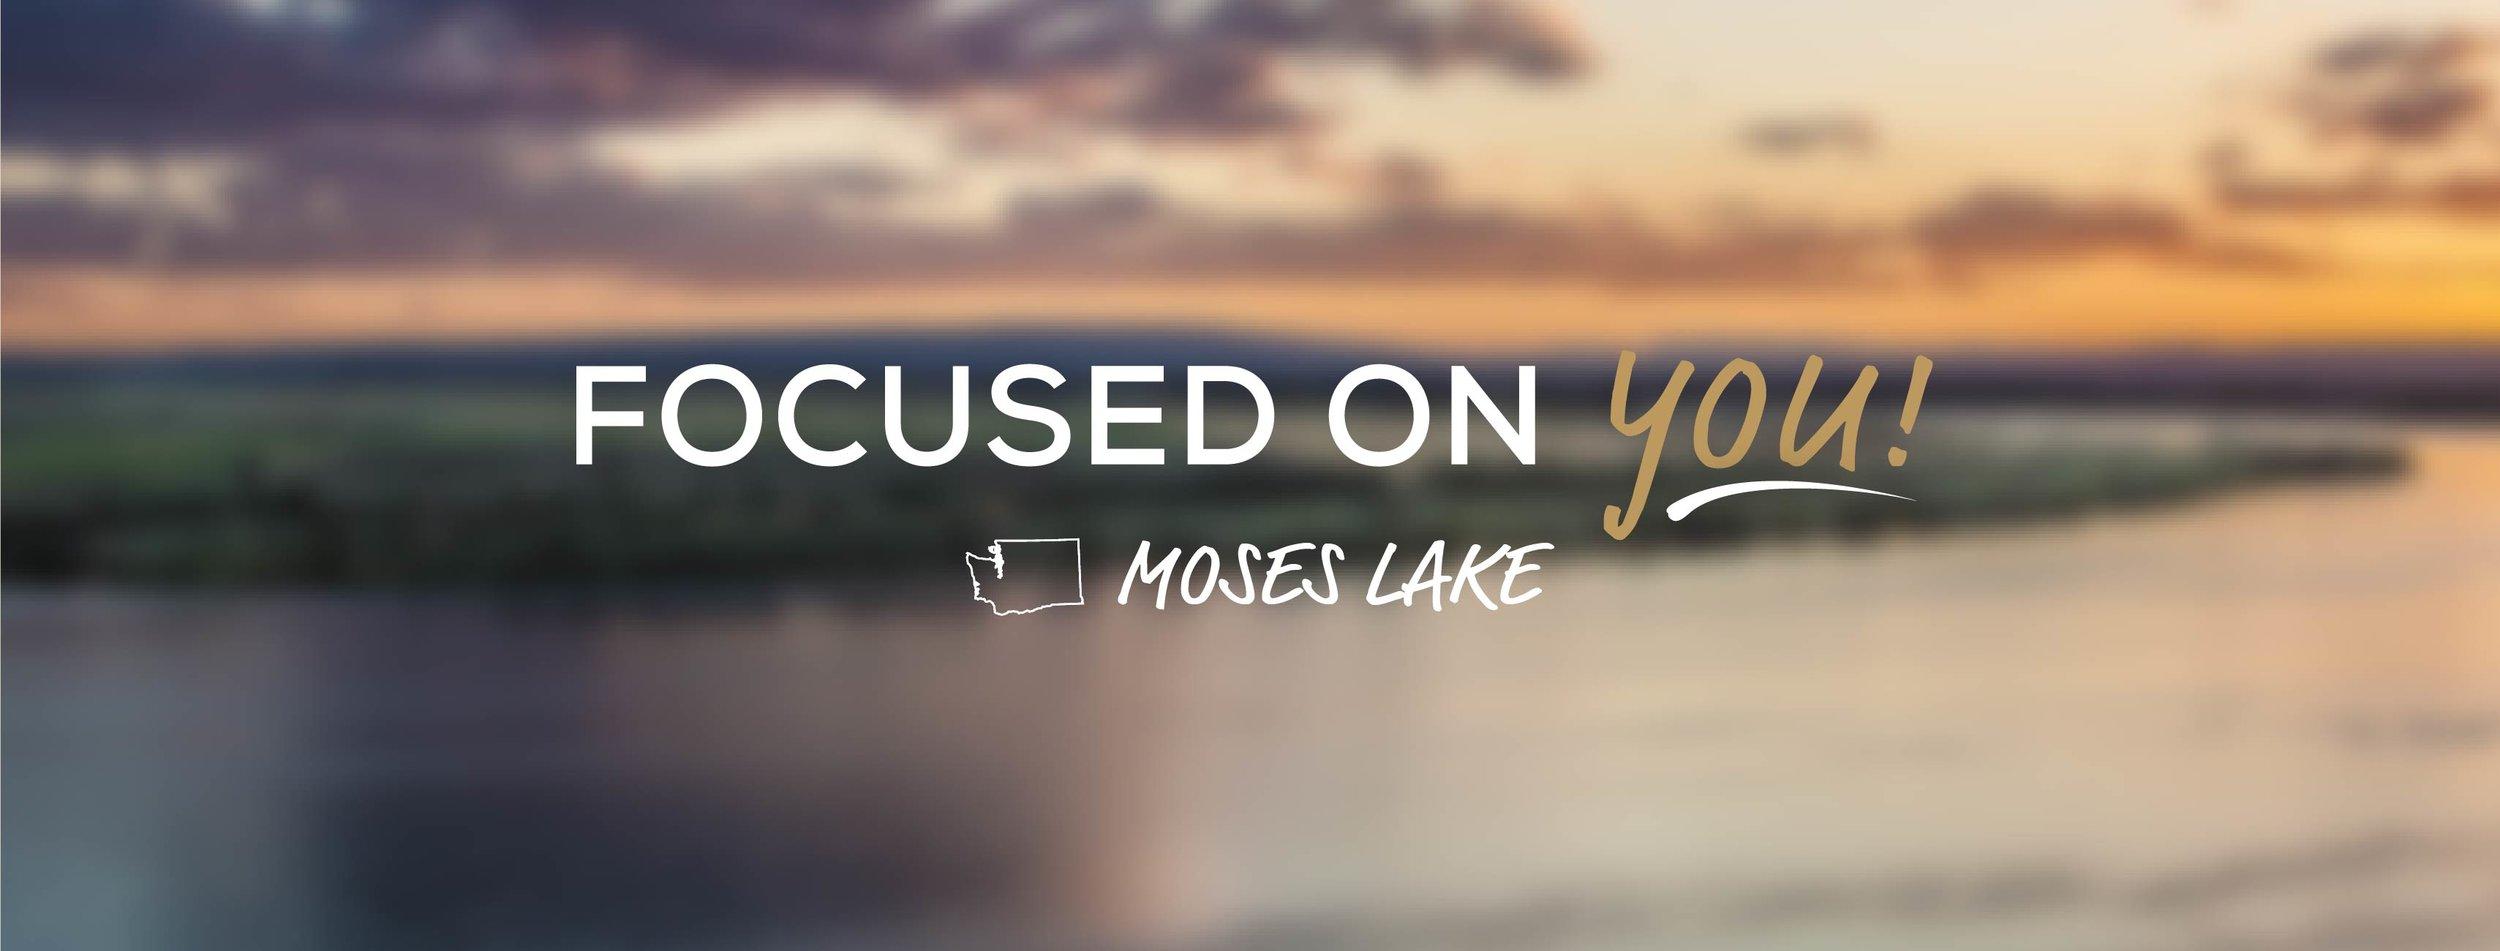 Moses Lake - 509.762.6128moseslake@directorsmortage.net1240 South Pioneer Way, Suite BMoses Lake, WA 98837